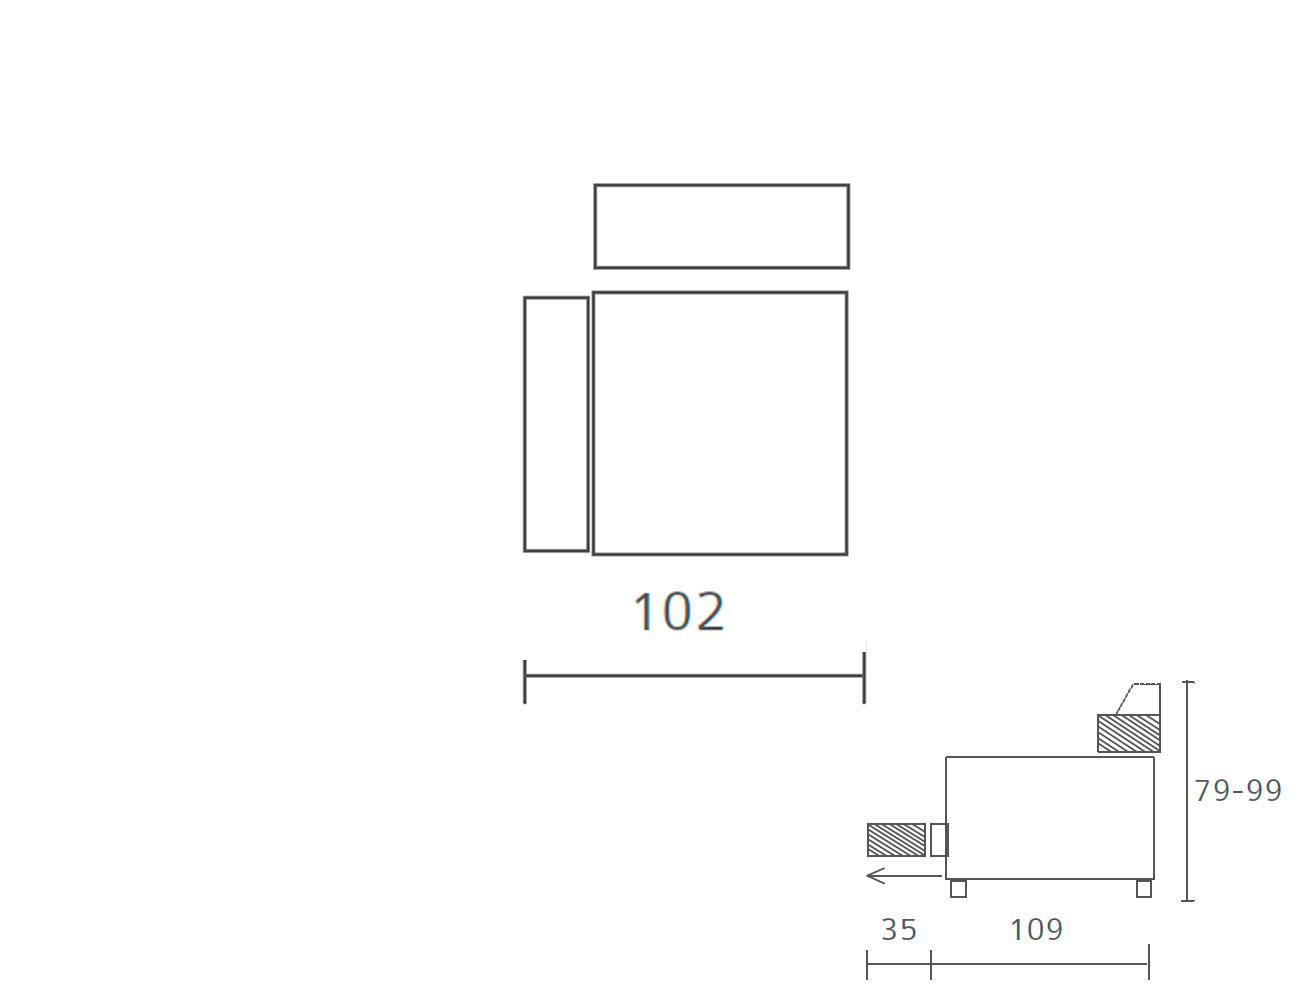 Sofa piel 1 plaza 1022